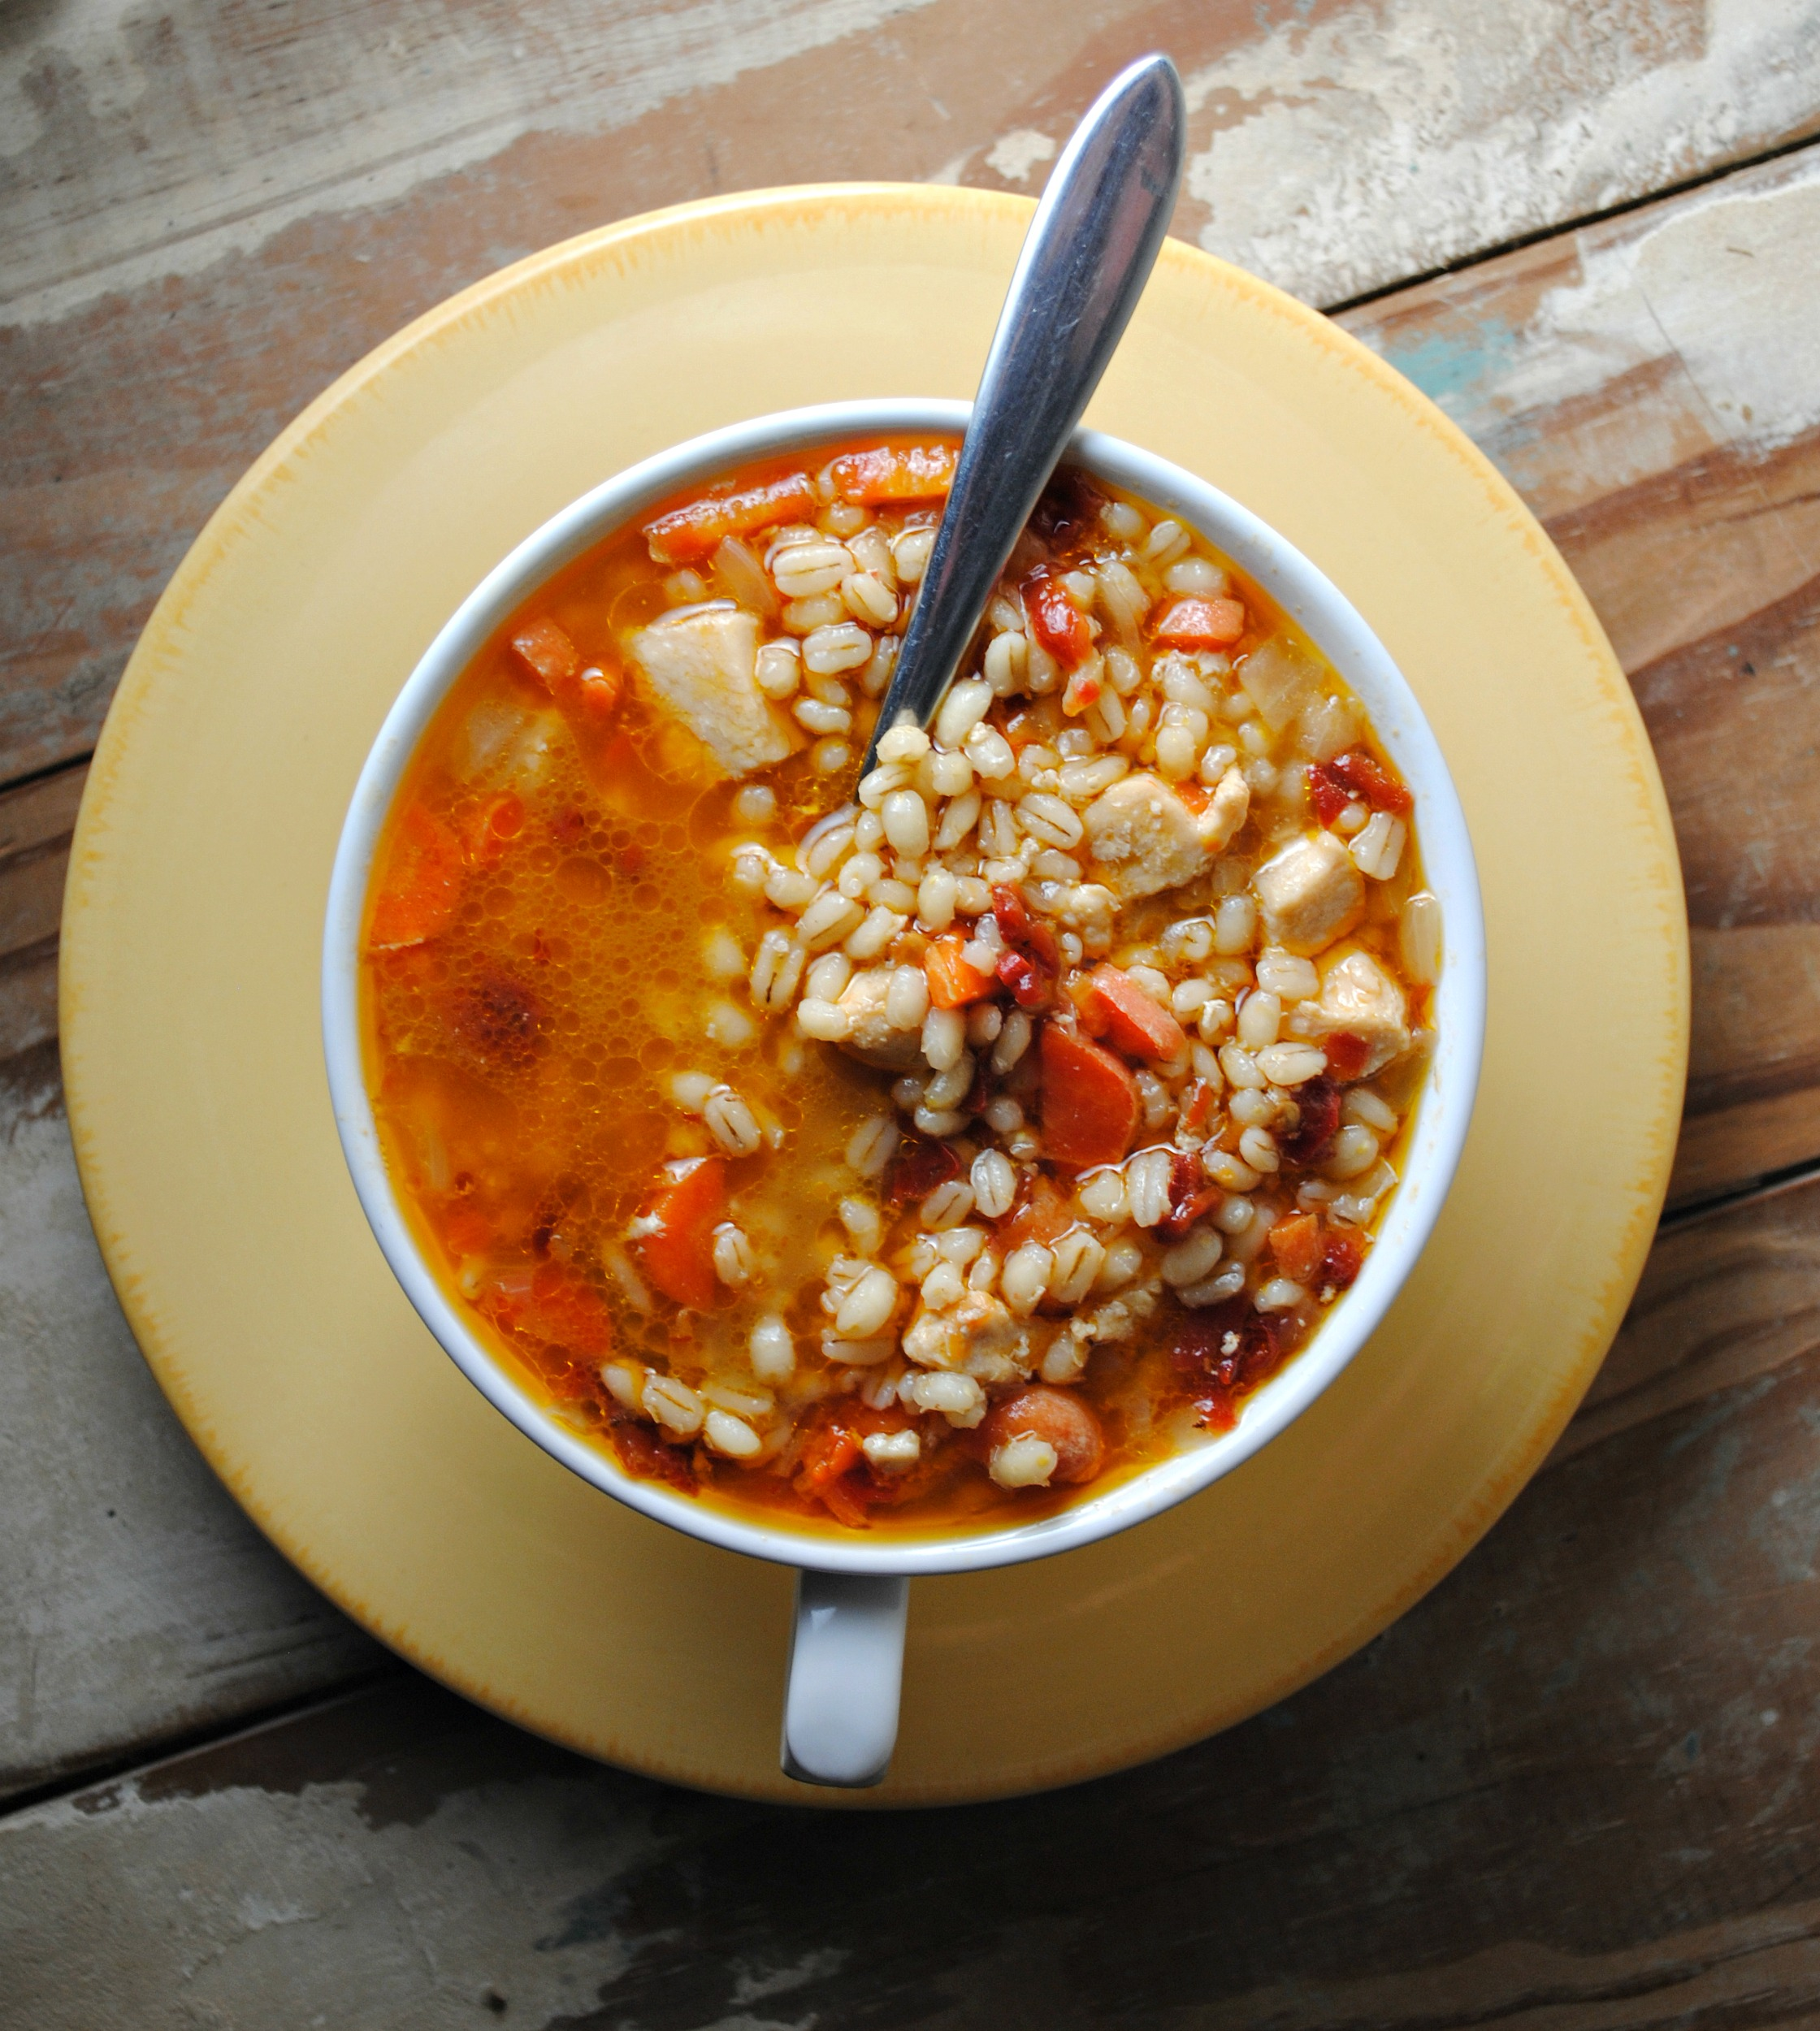 chipotle-chicken-barley-soup-vianneyrodriguez-sweetlifebake